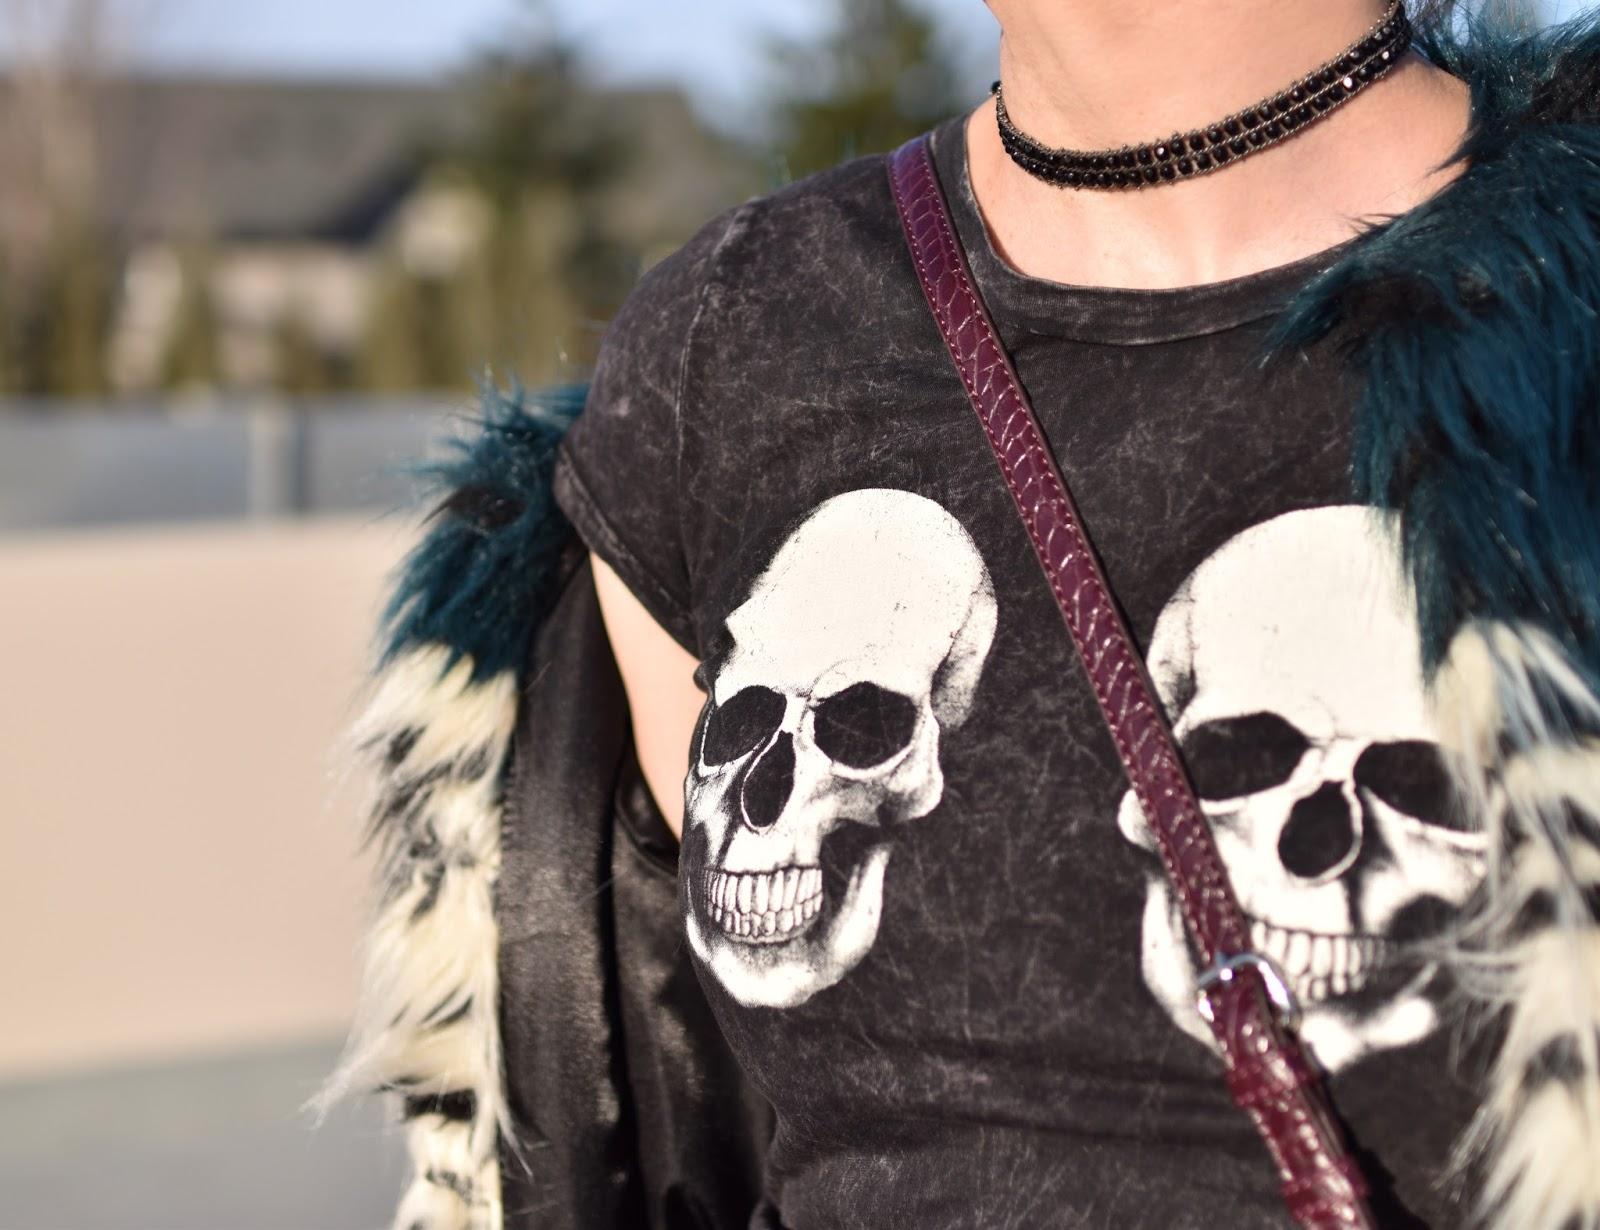 Monika Faulkner outfit inspiration - skull-motif t-shirt, beaded choker